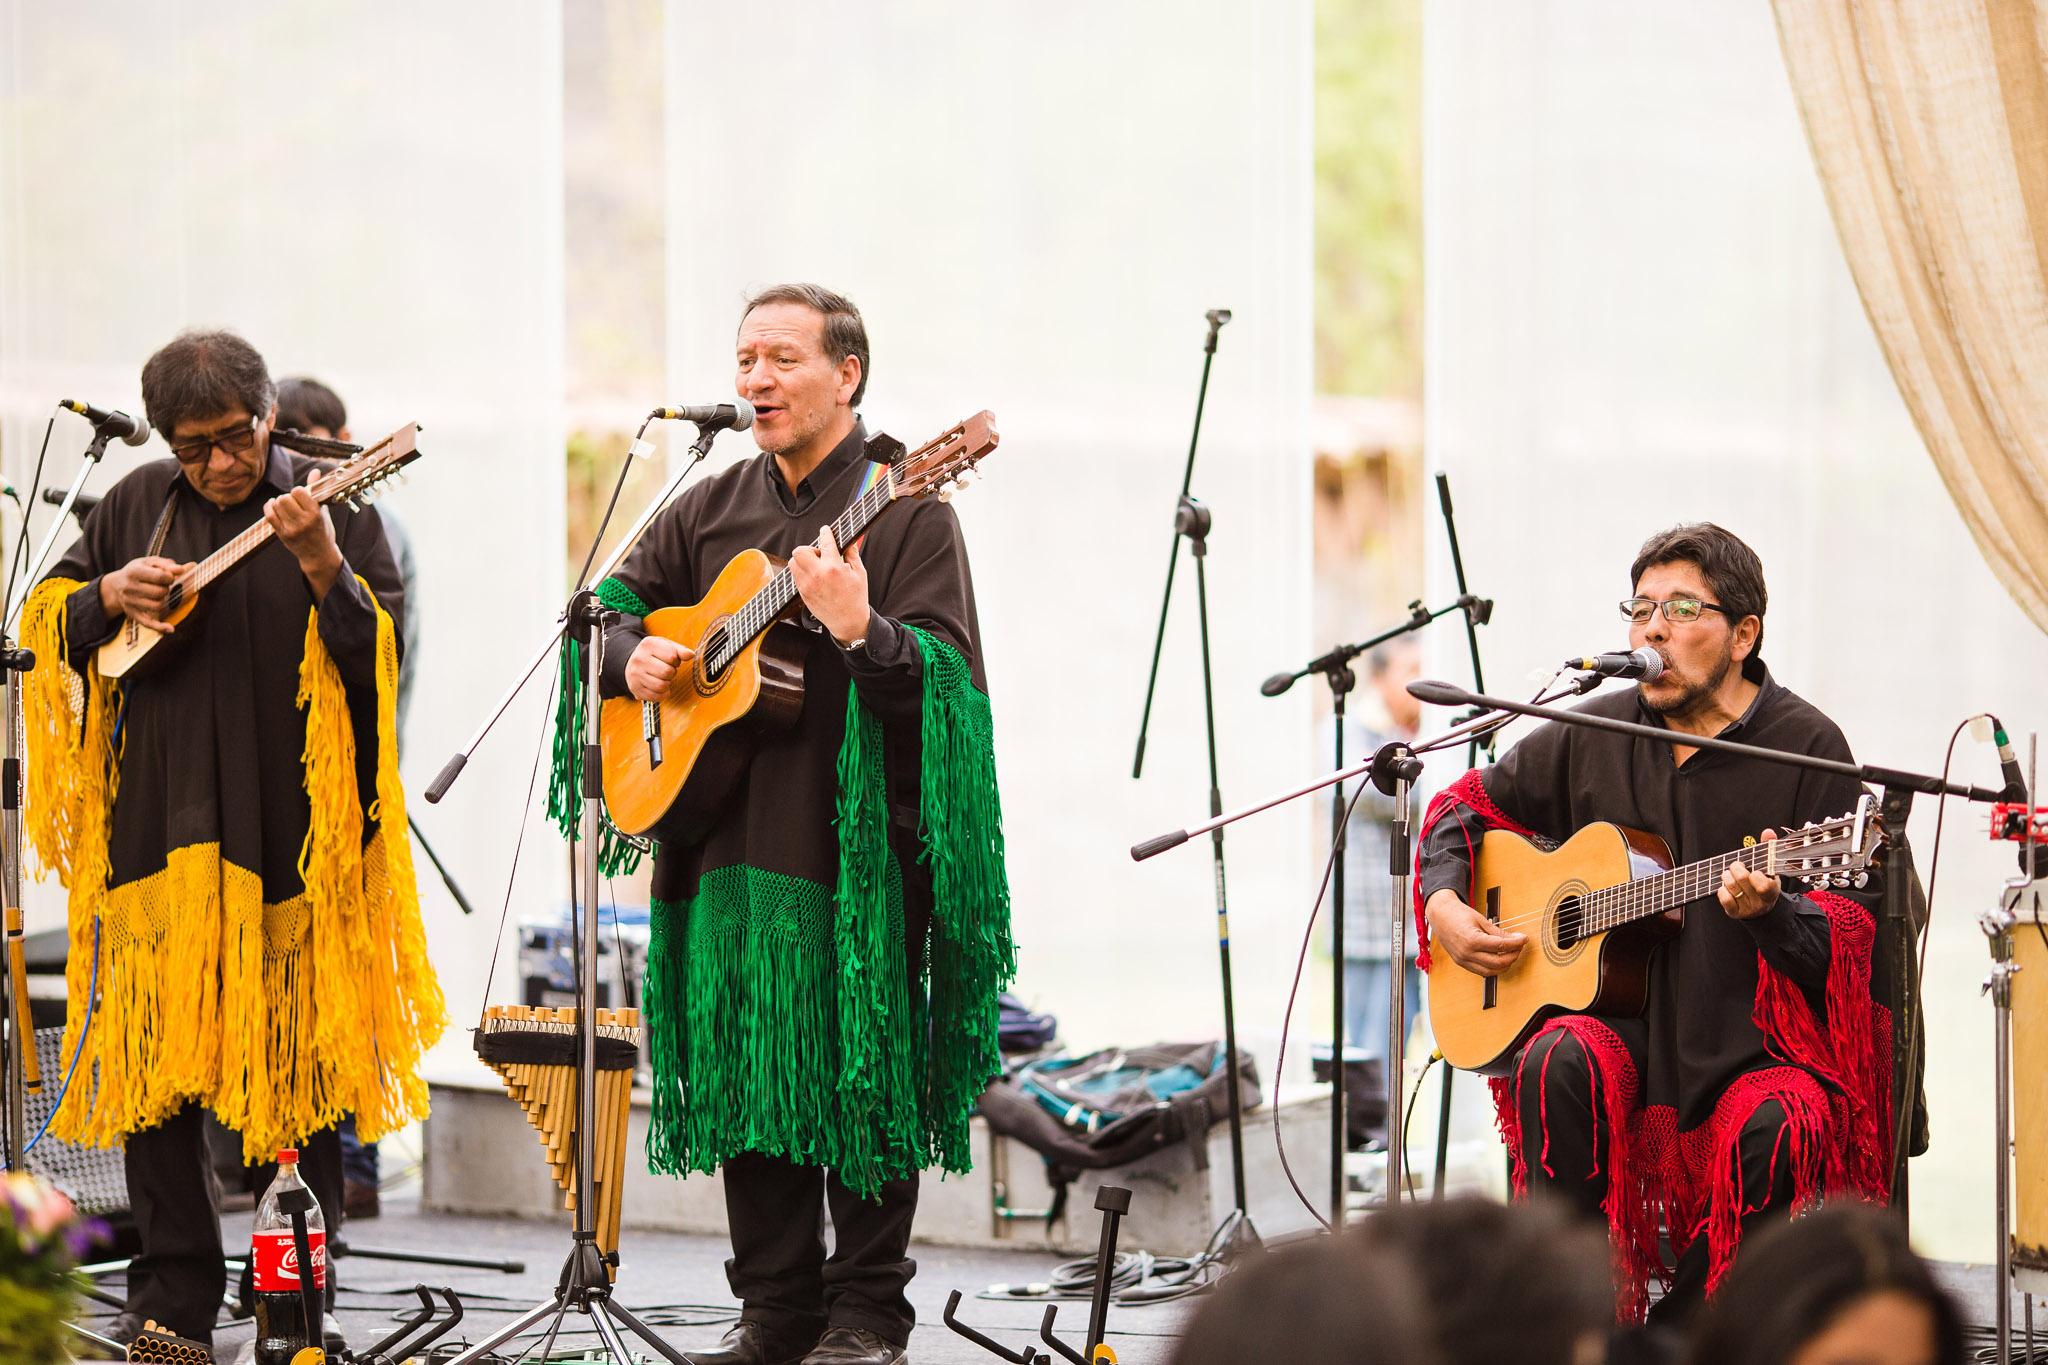 Wedding-Travellers-Destination-Wedding-Peru-Cusco-Hacienda-Sarapampa-Sacred-Valley-traditional-band